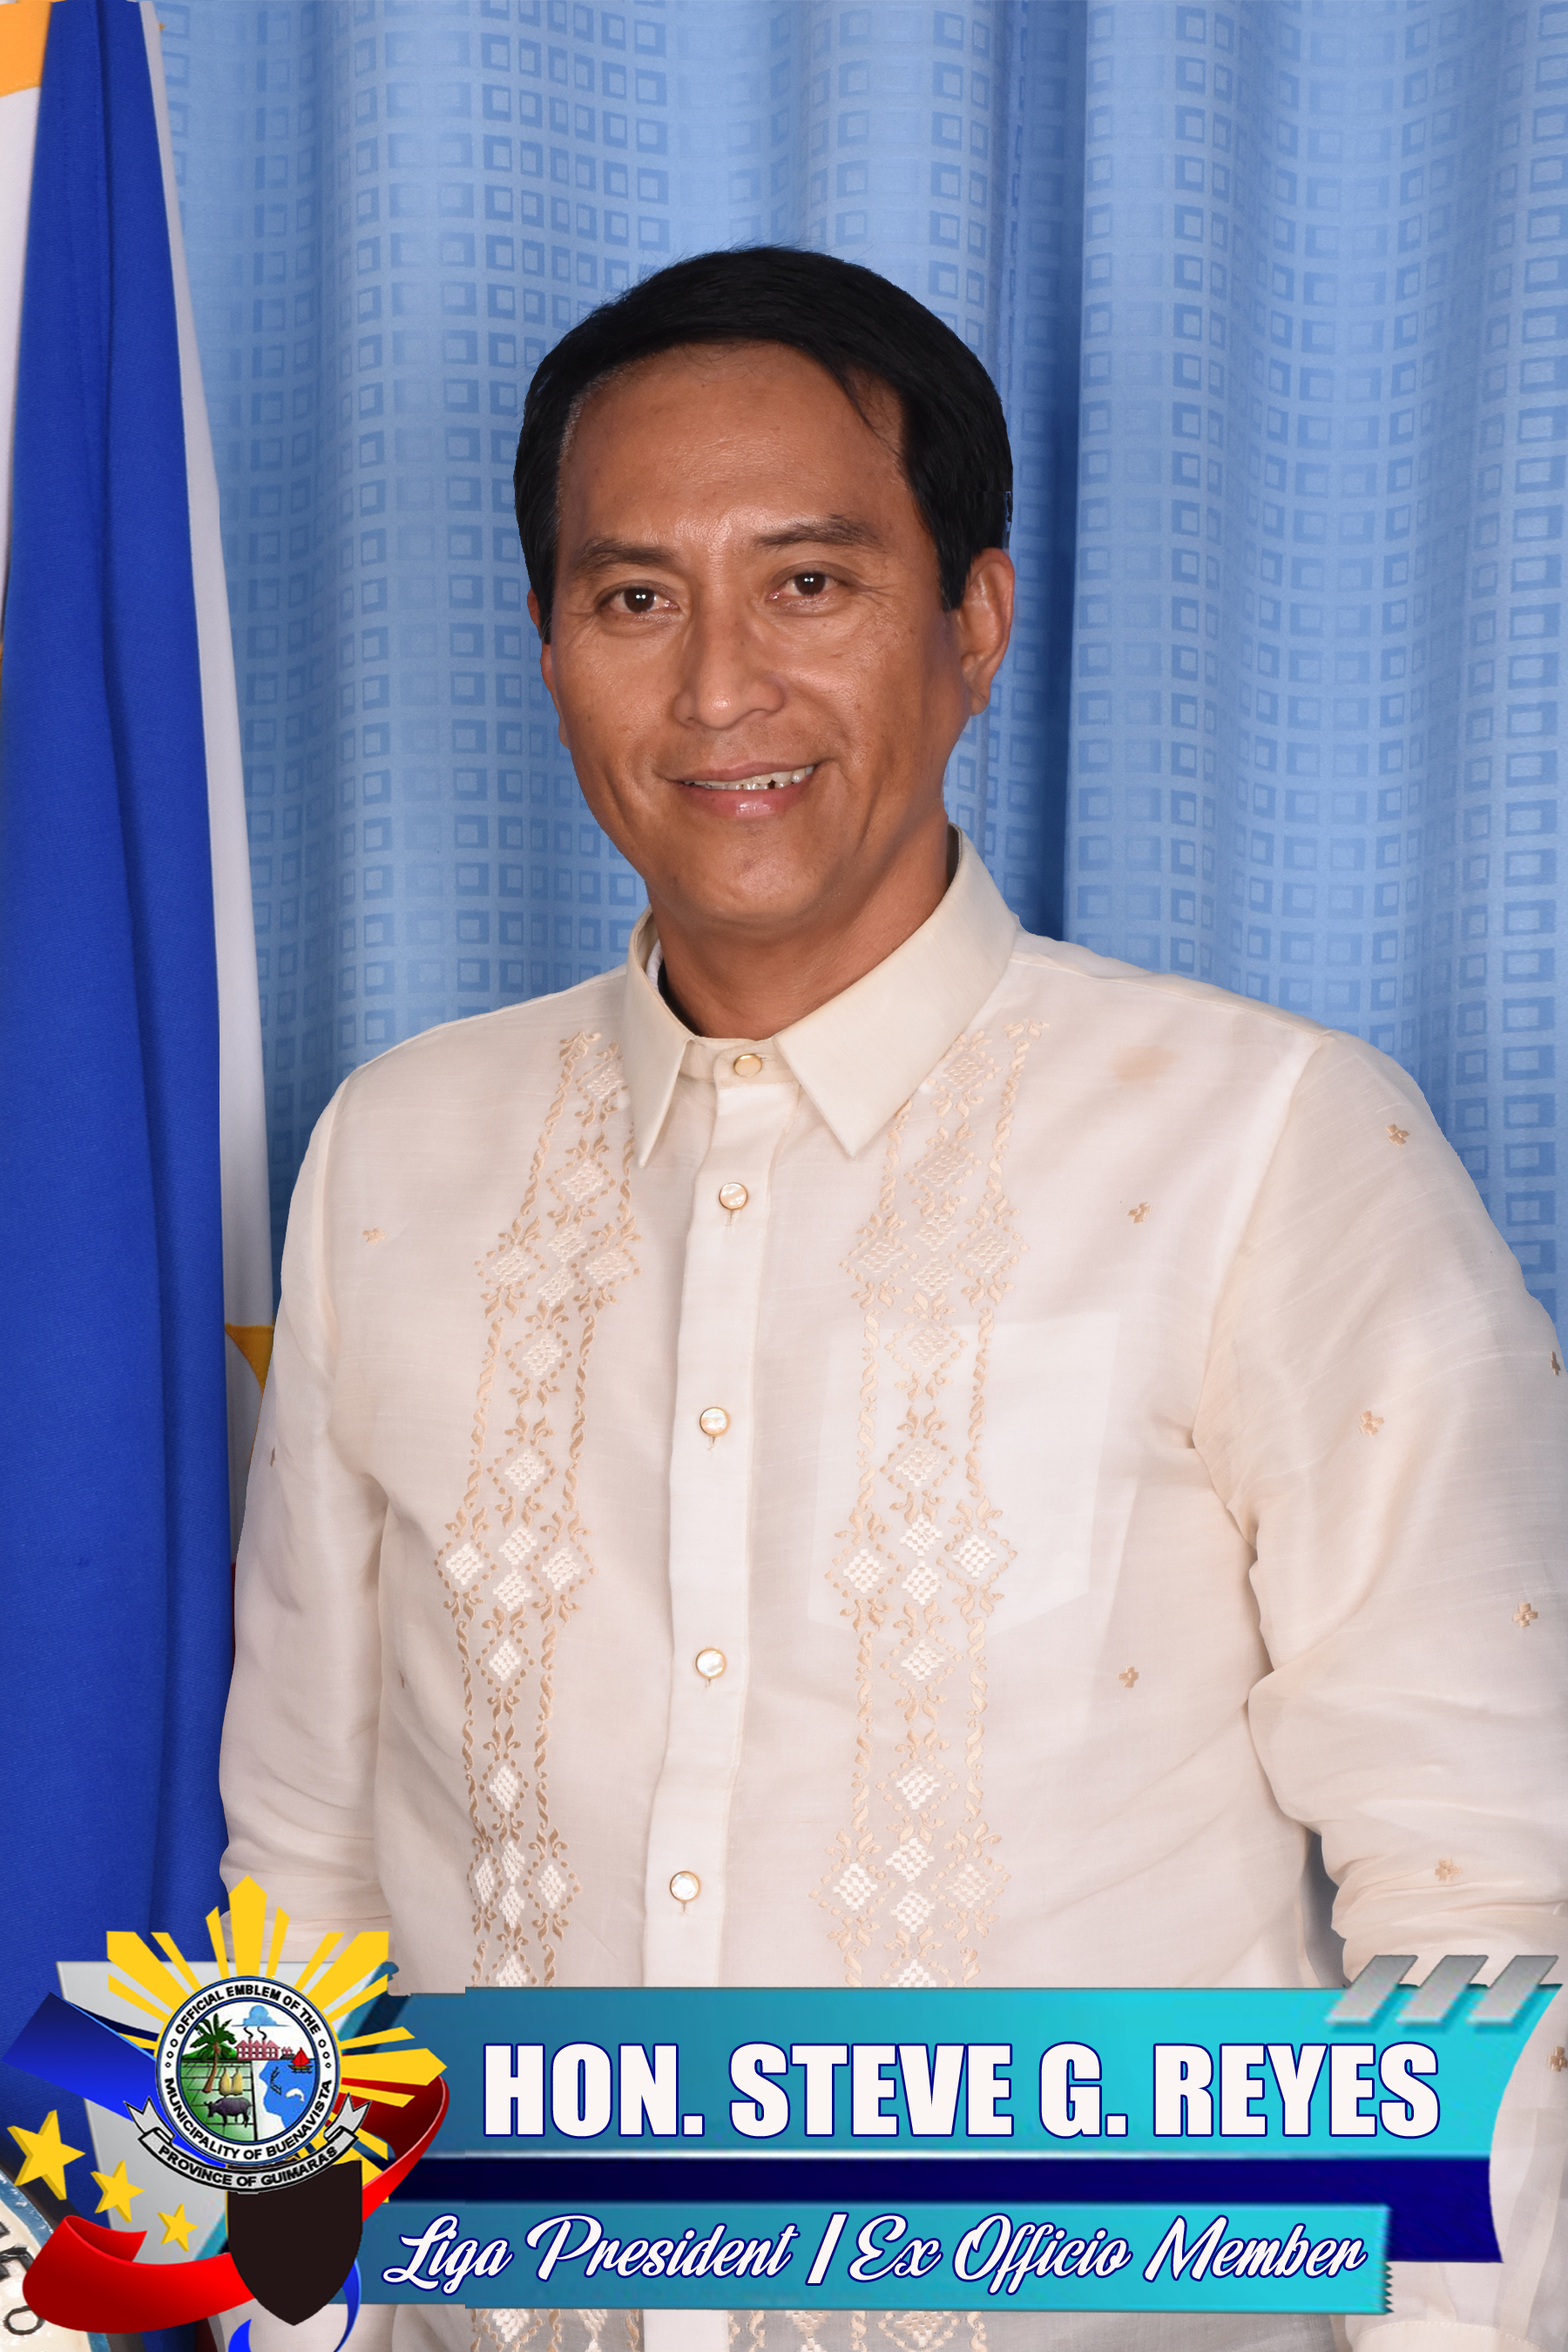 Hon. Steve G. Reyes